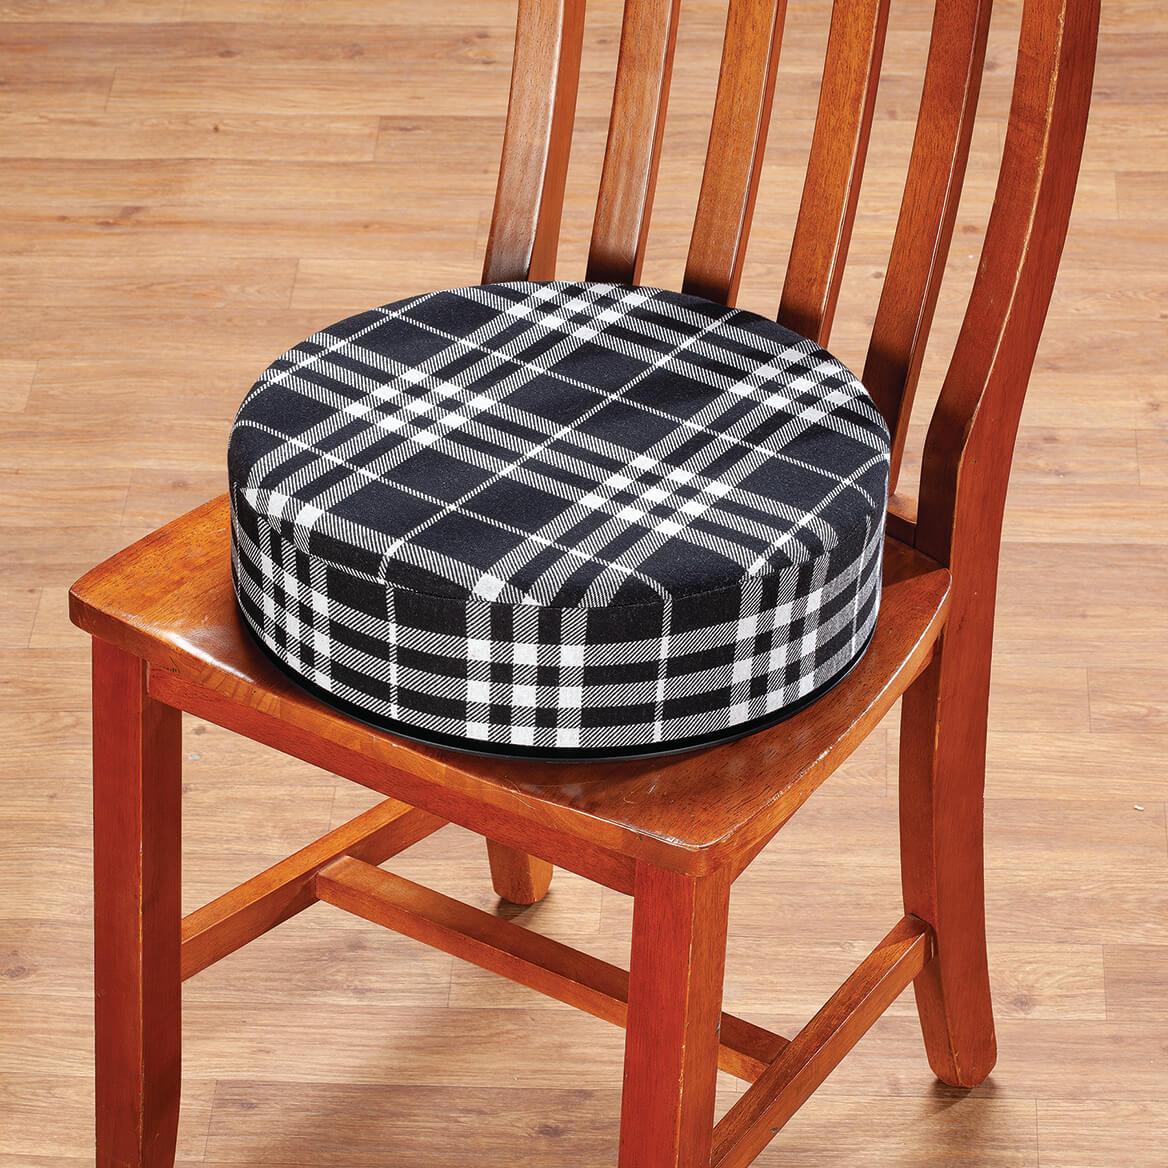 Extra Thick Swivel Seat Cushion-356547